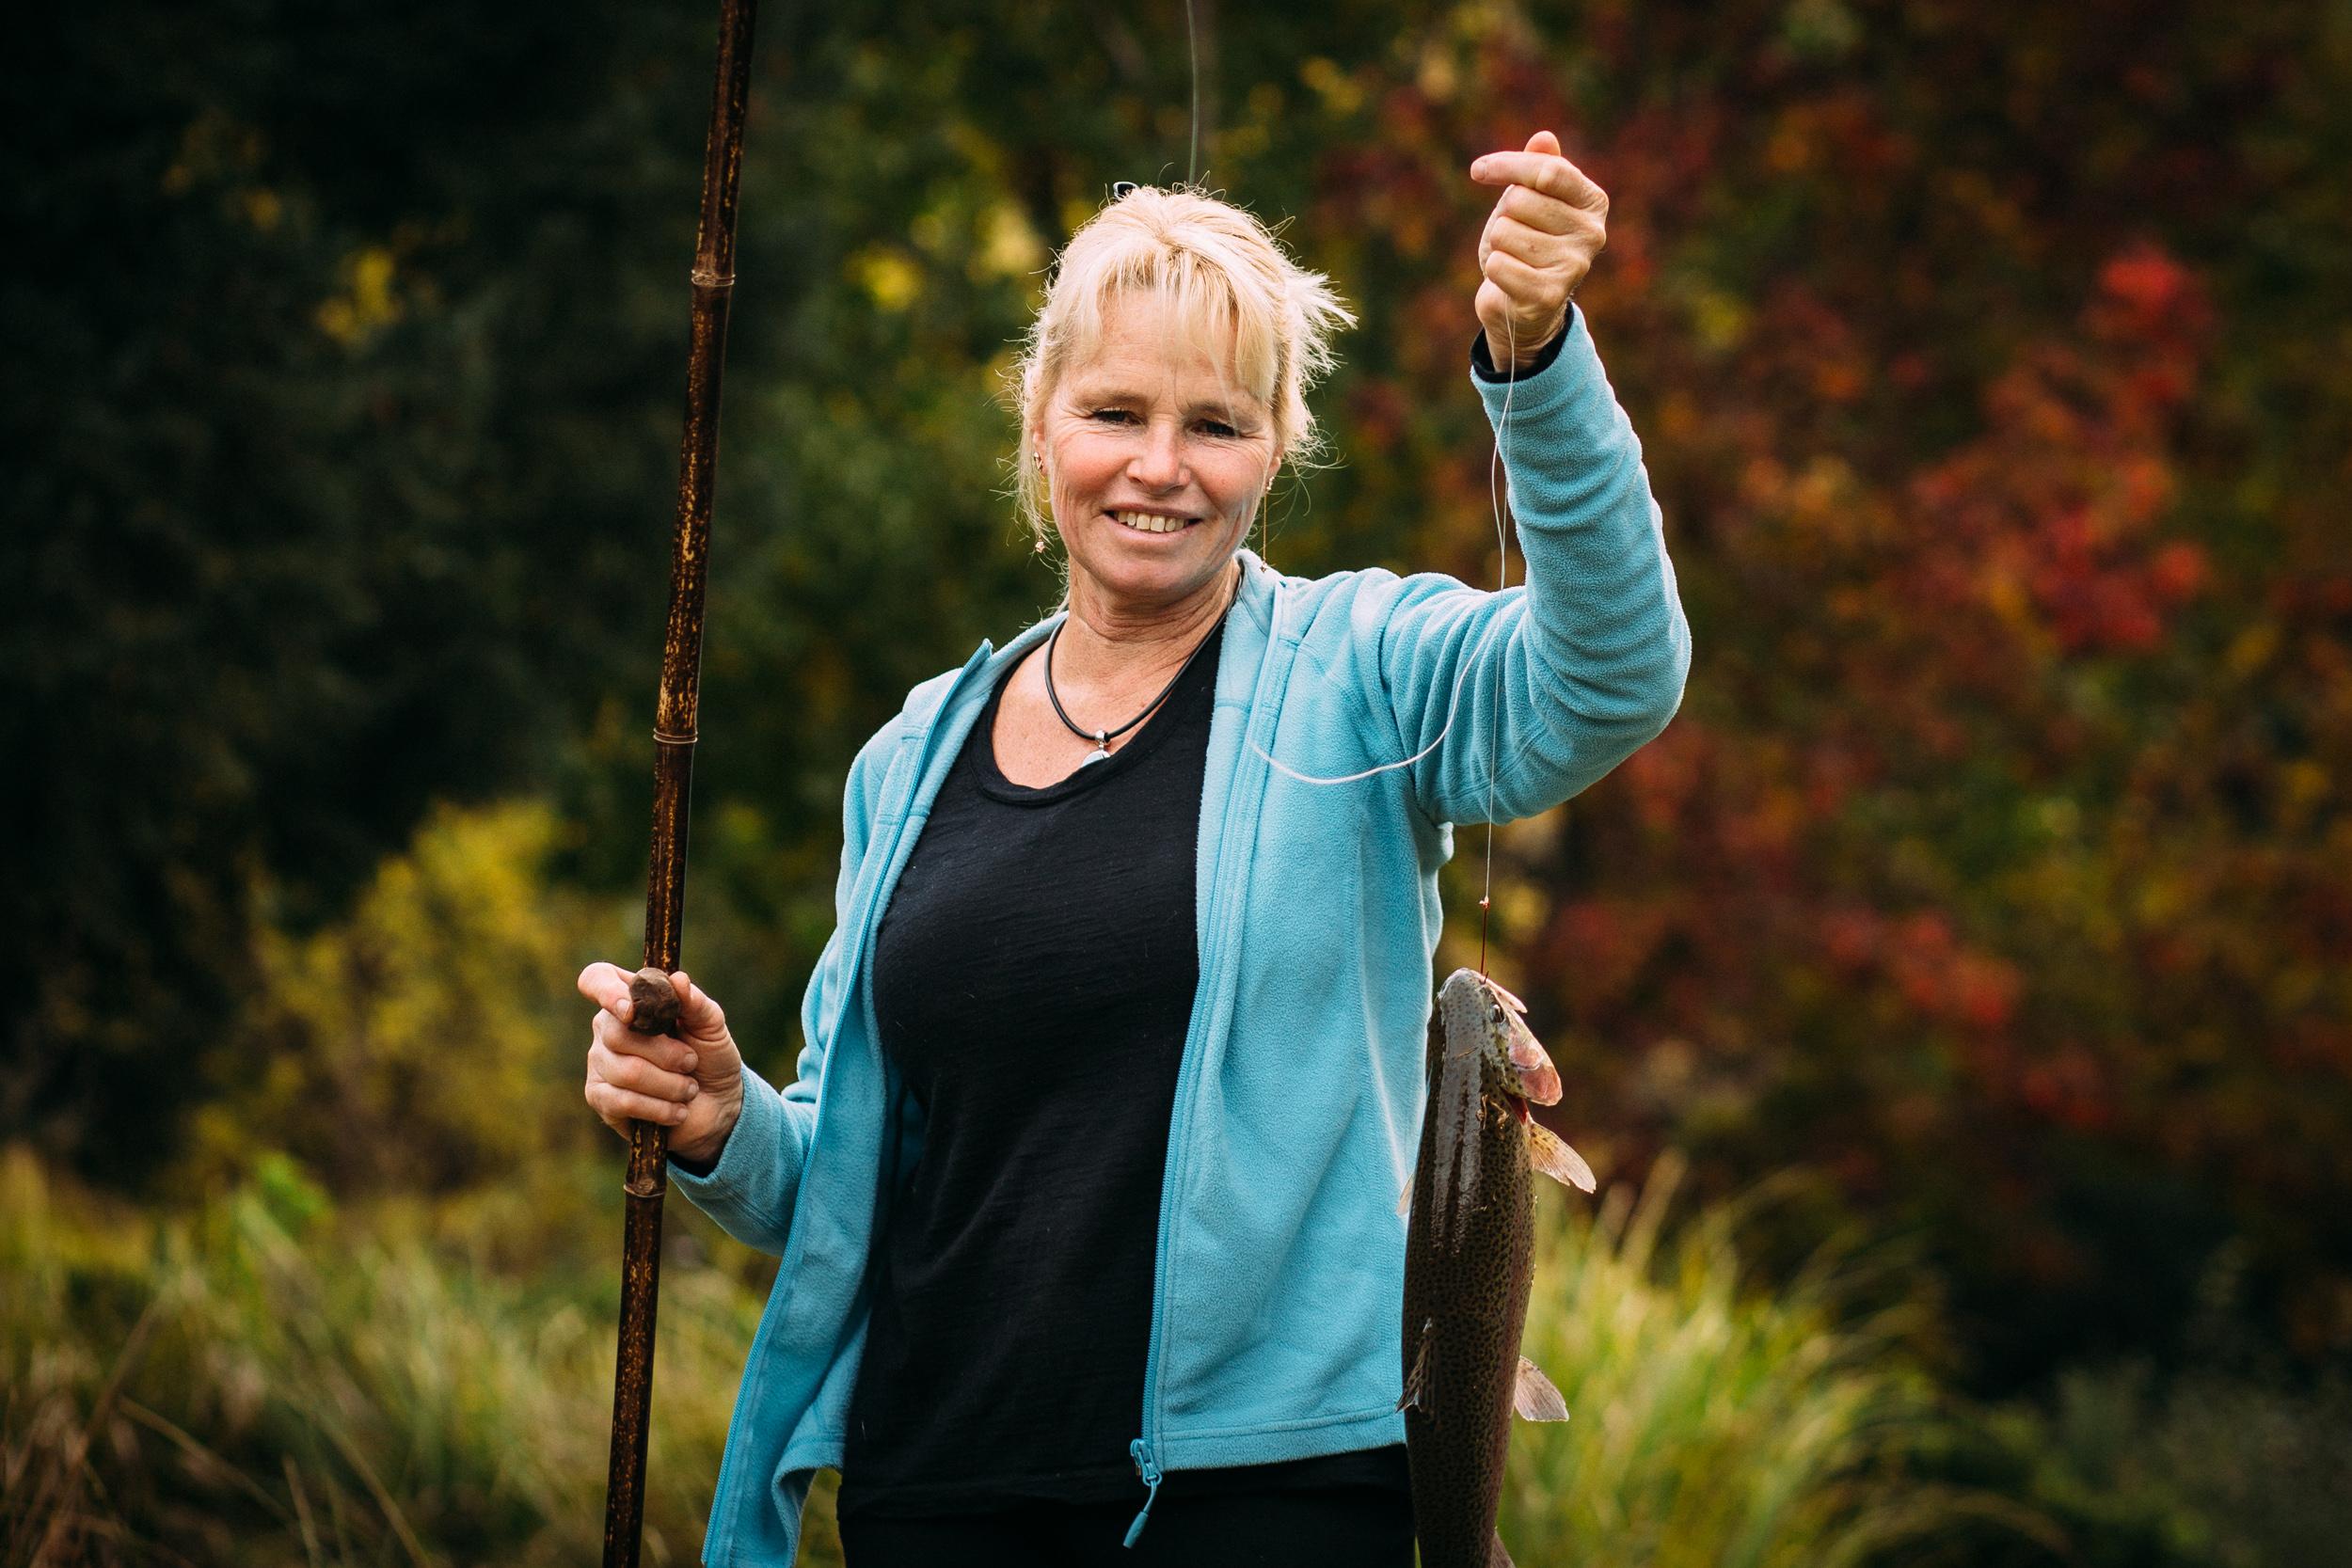 Sally Hall (trout farmer, VIC)